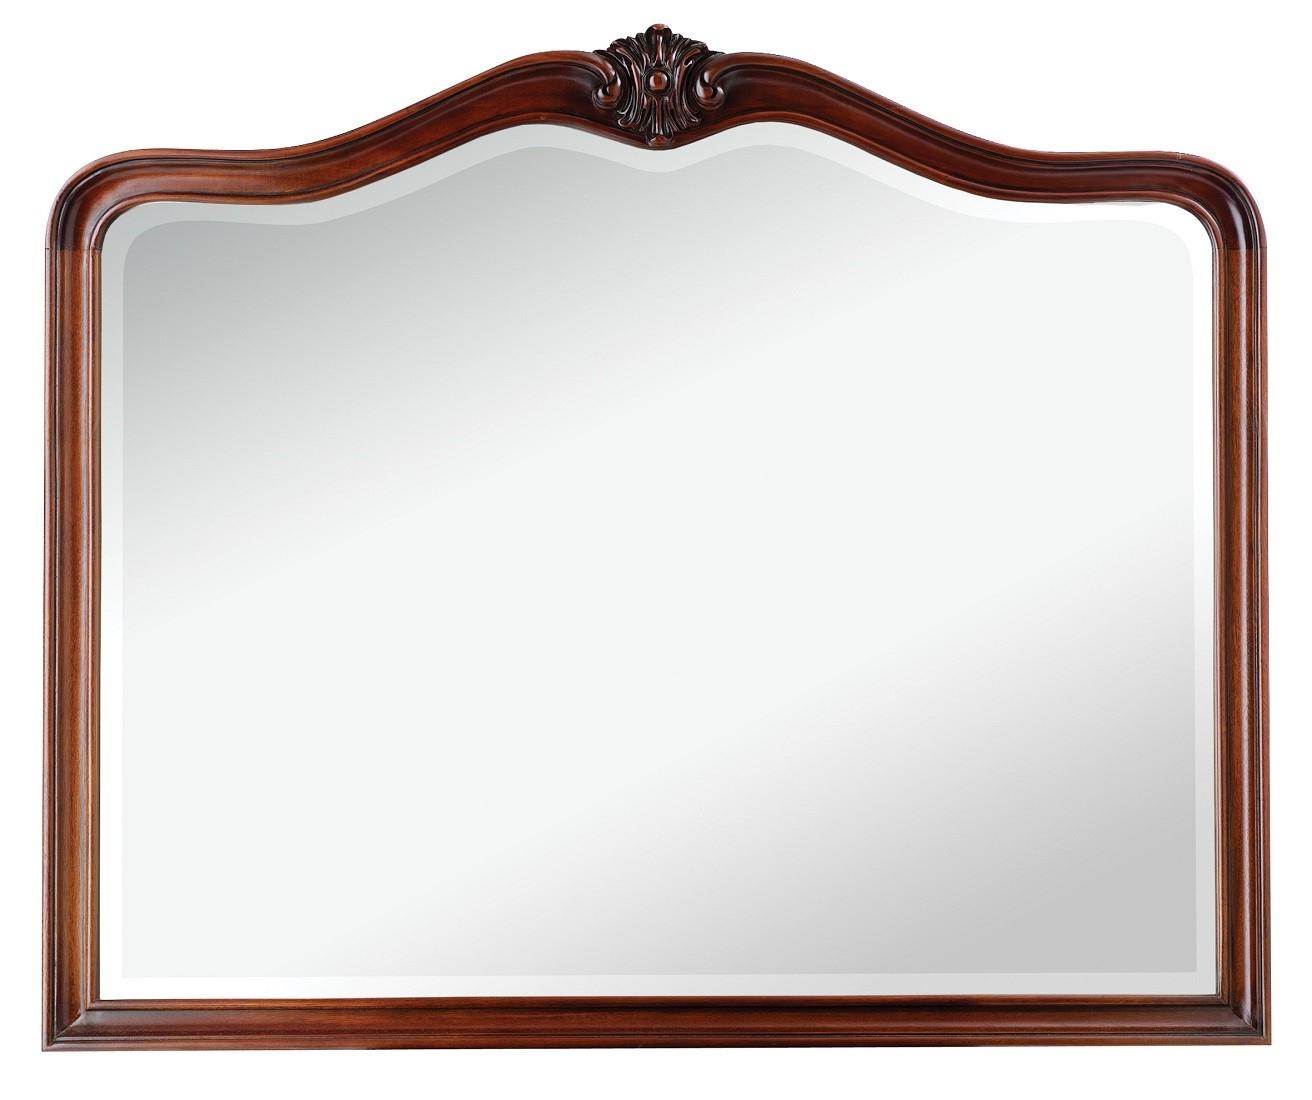 Preferred Mahogany Wall Mirrors Intended For Louis French Mahogany Wall Mirror (View 14 of 20)